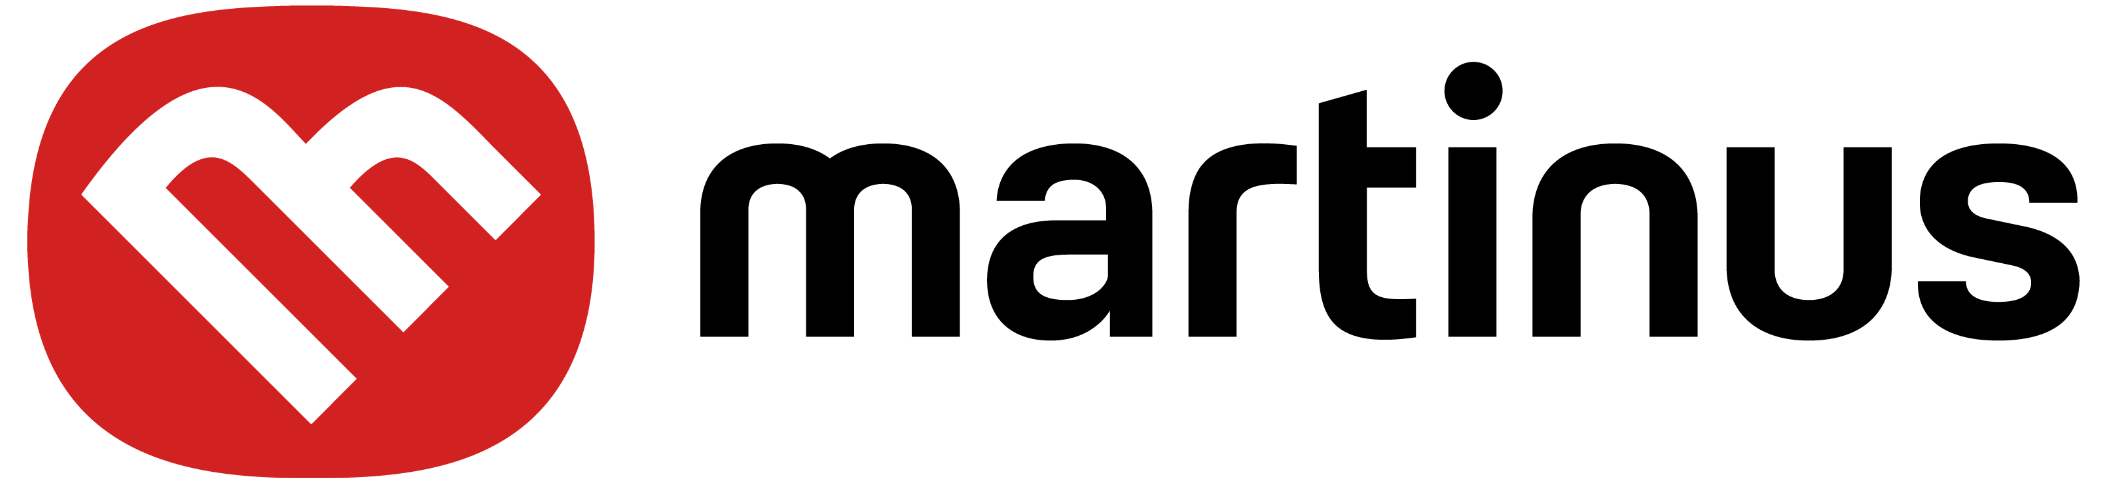 Výsledek obrázku pro martinus logo